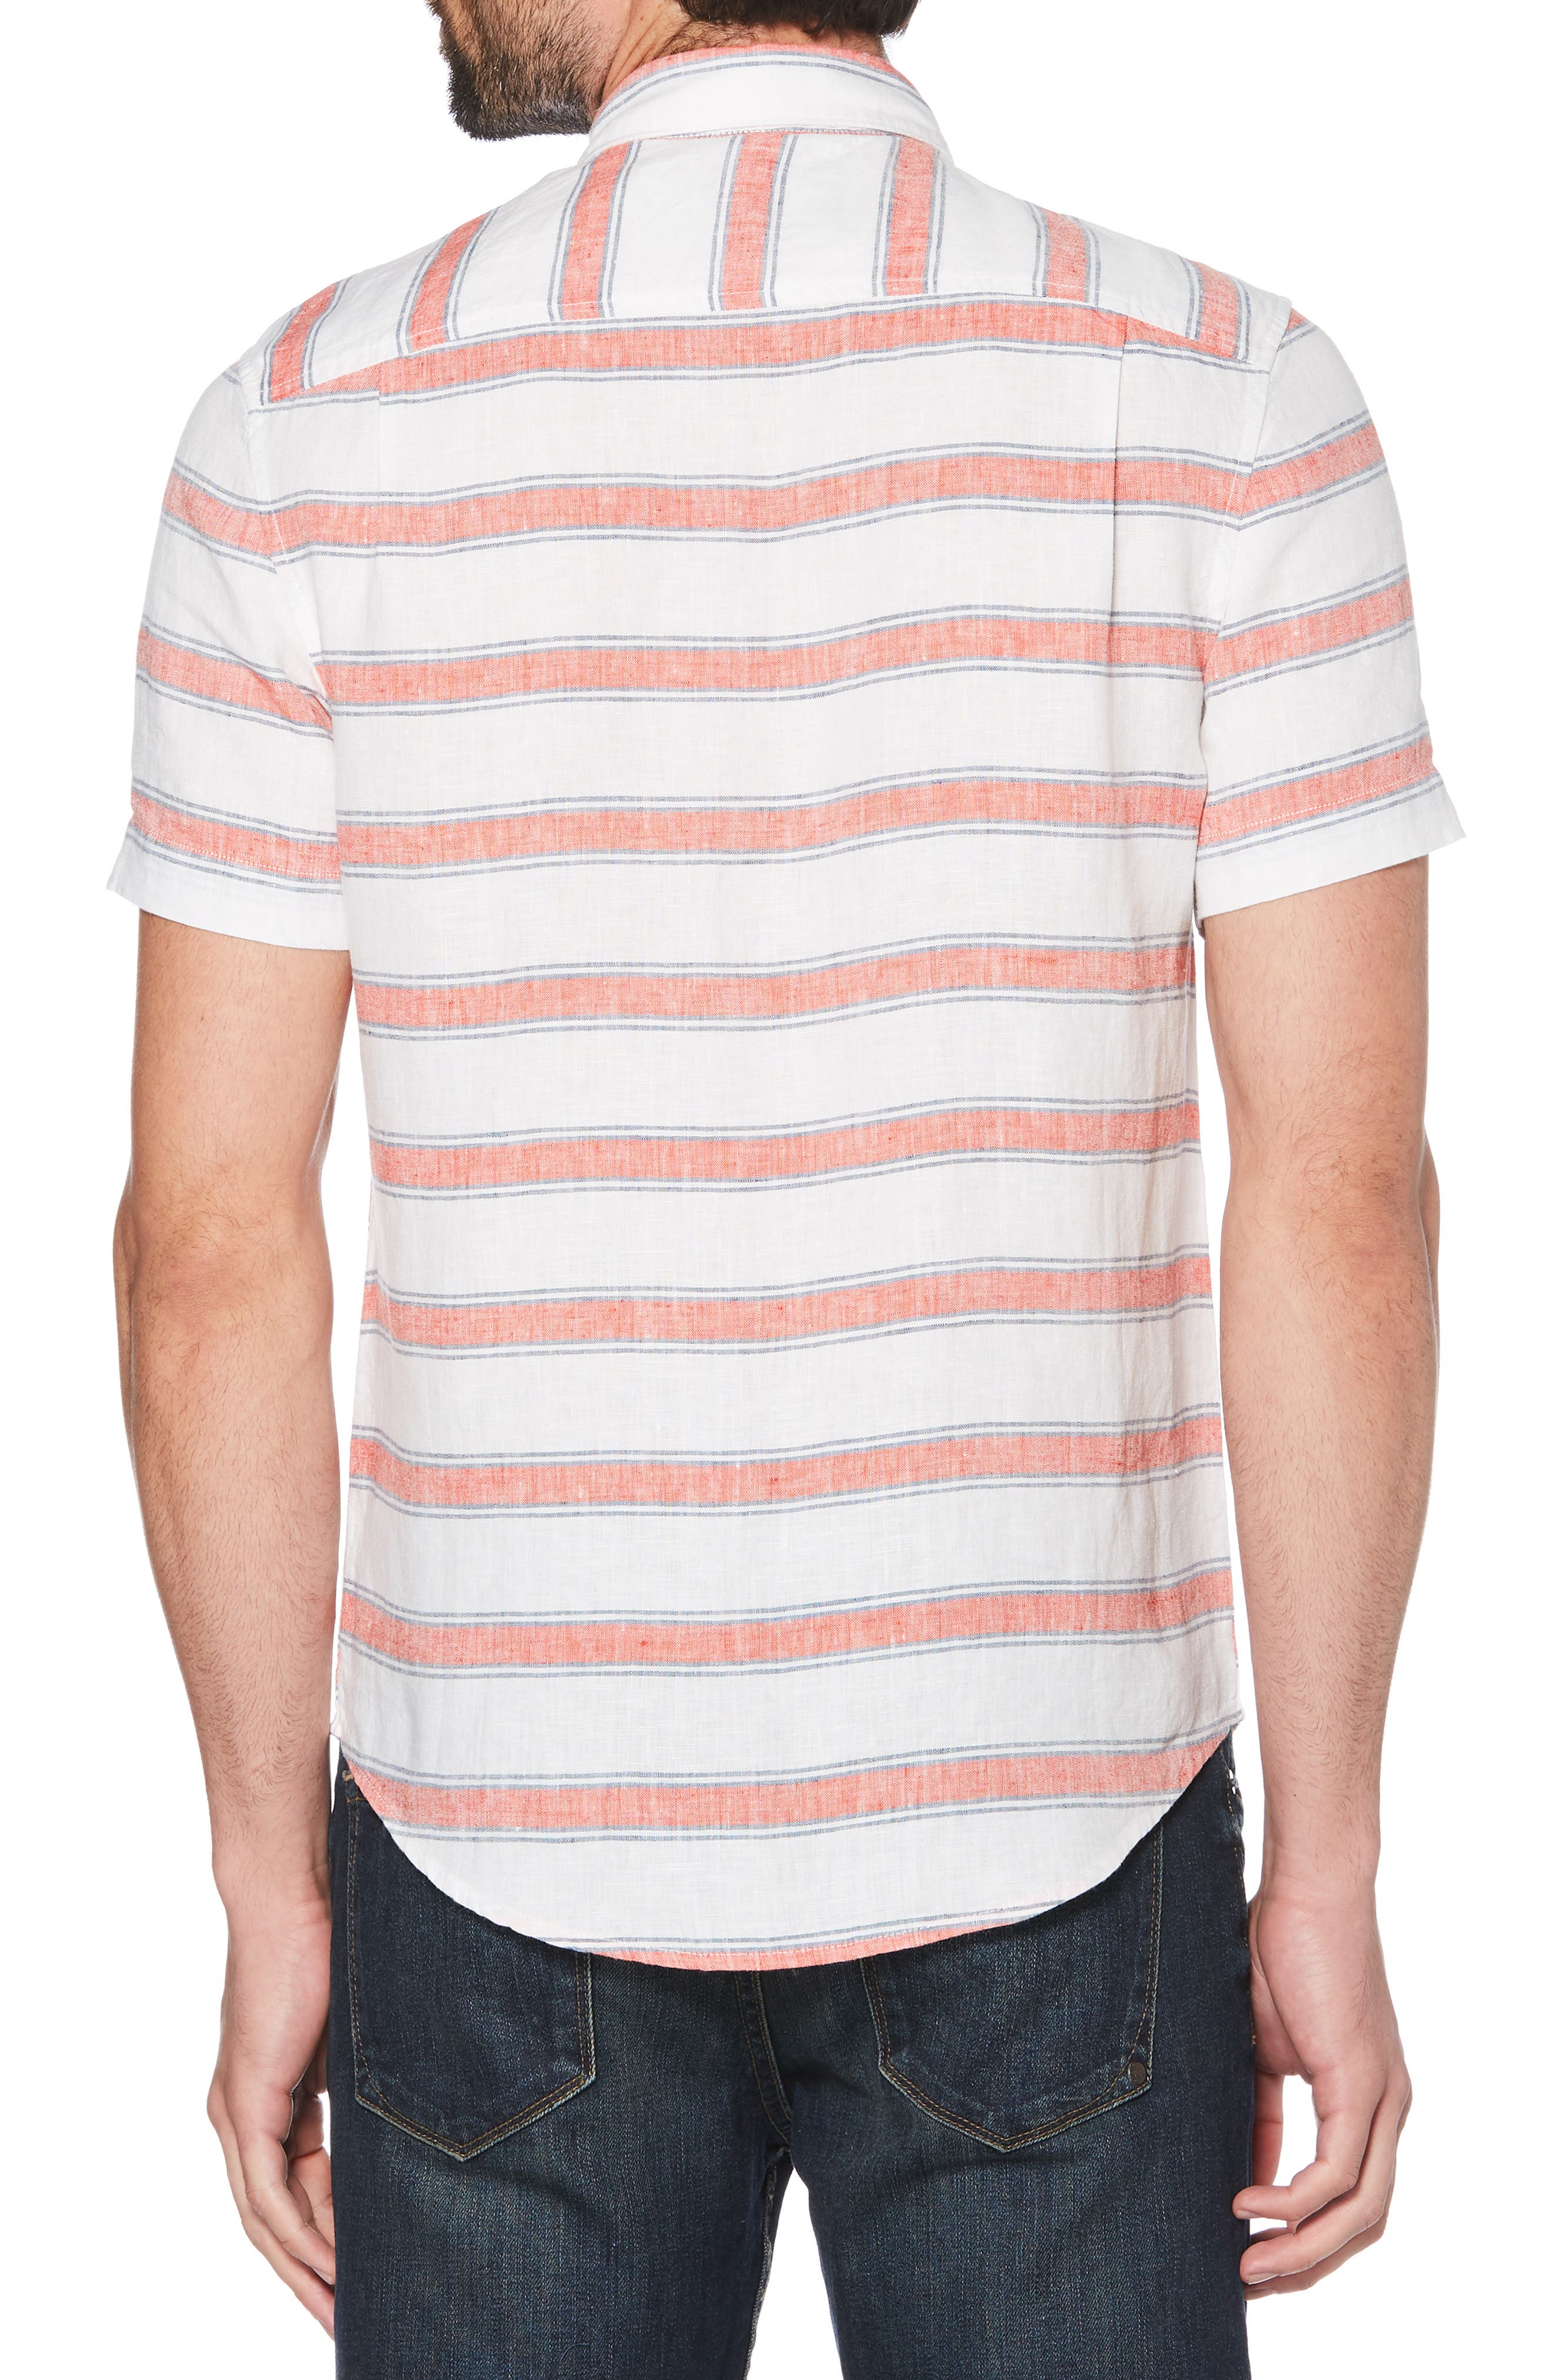 ORIGINAL PENGUIN, Horizontal Stripe Linen Shirt, Alternate thumbnail 3, color, BRIGHT WHITE